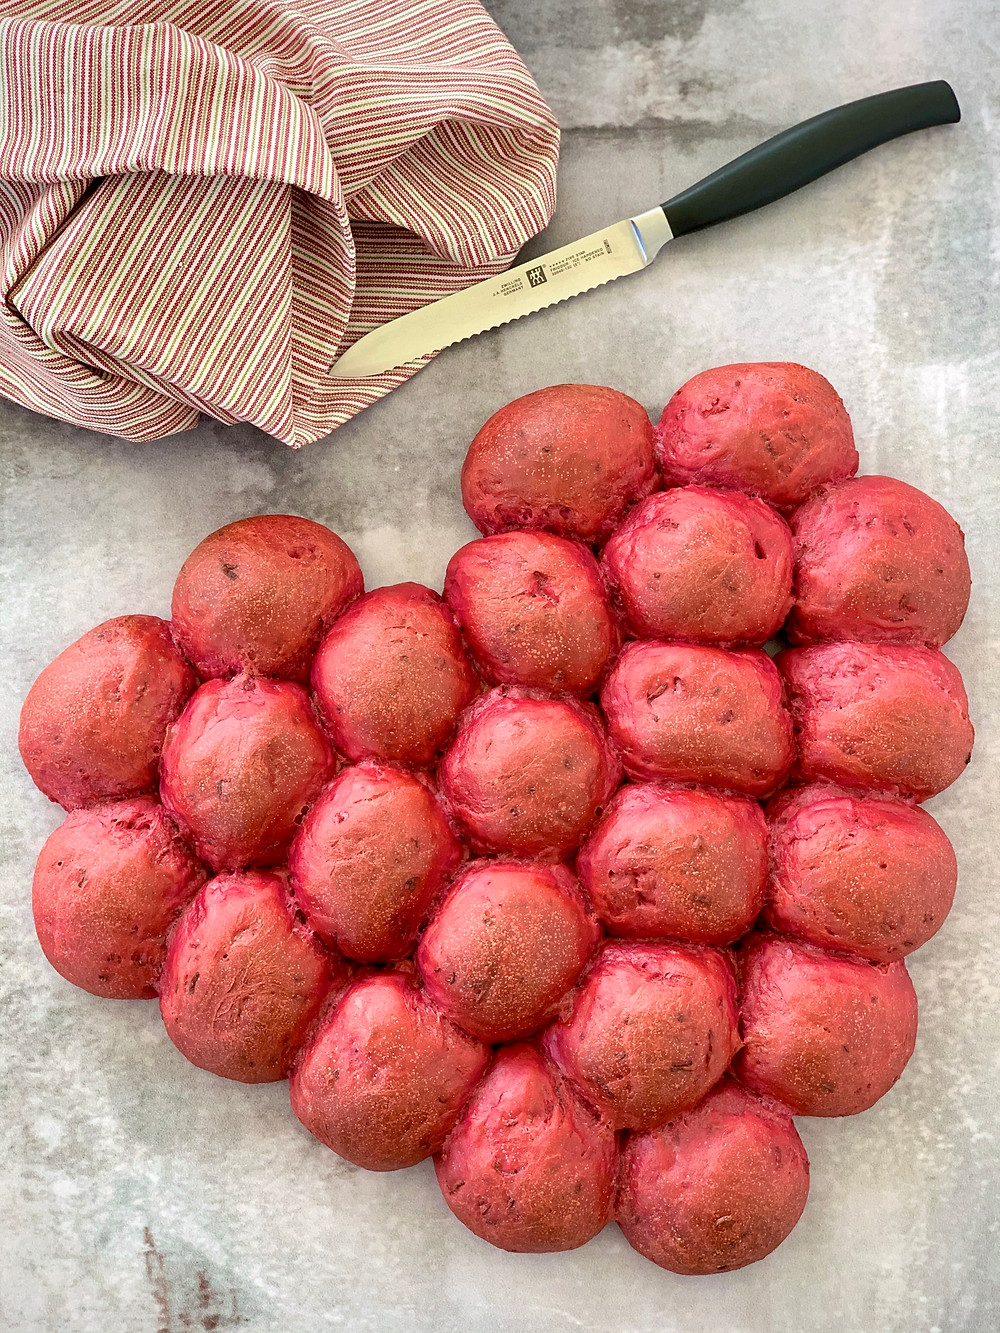 Vegansk hjerte-brydebrød (rødbedeboller)